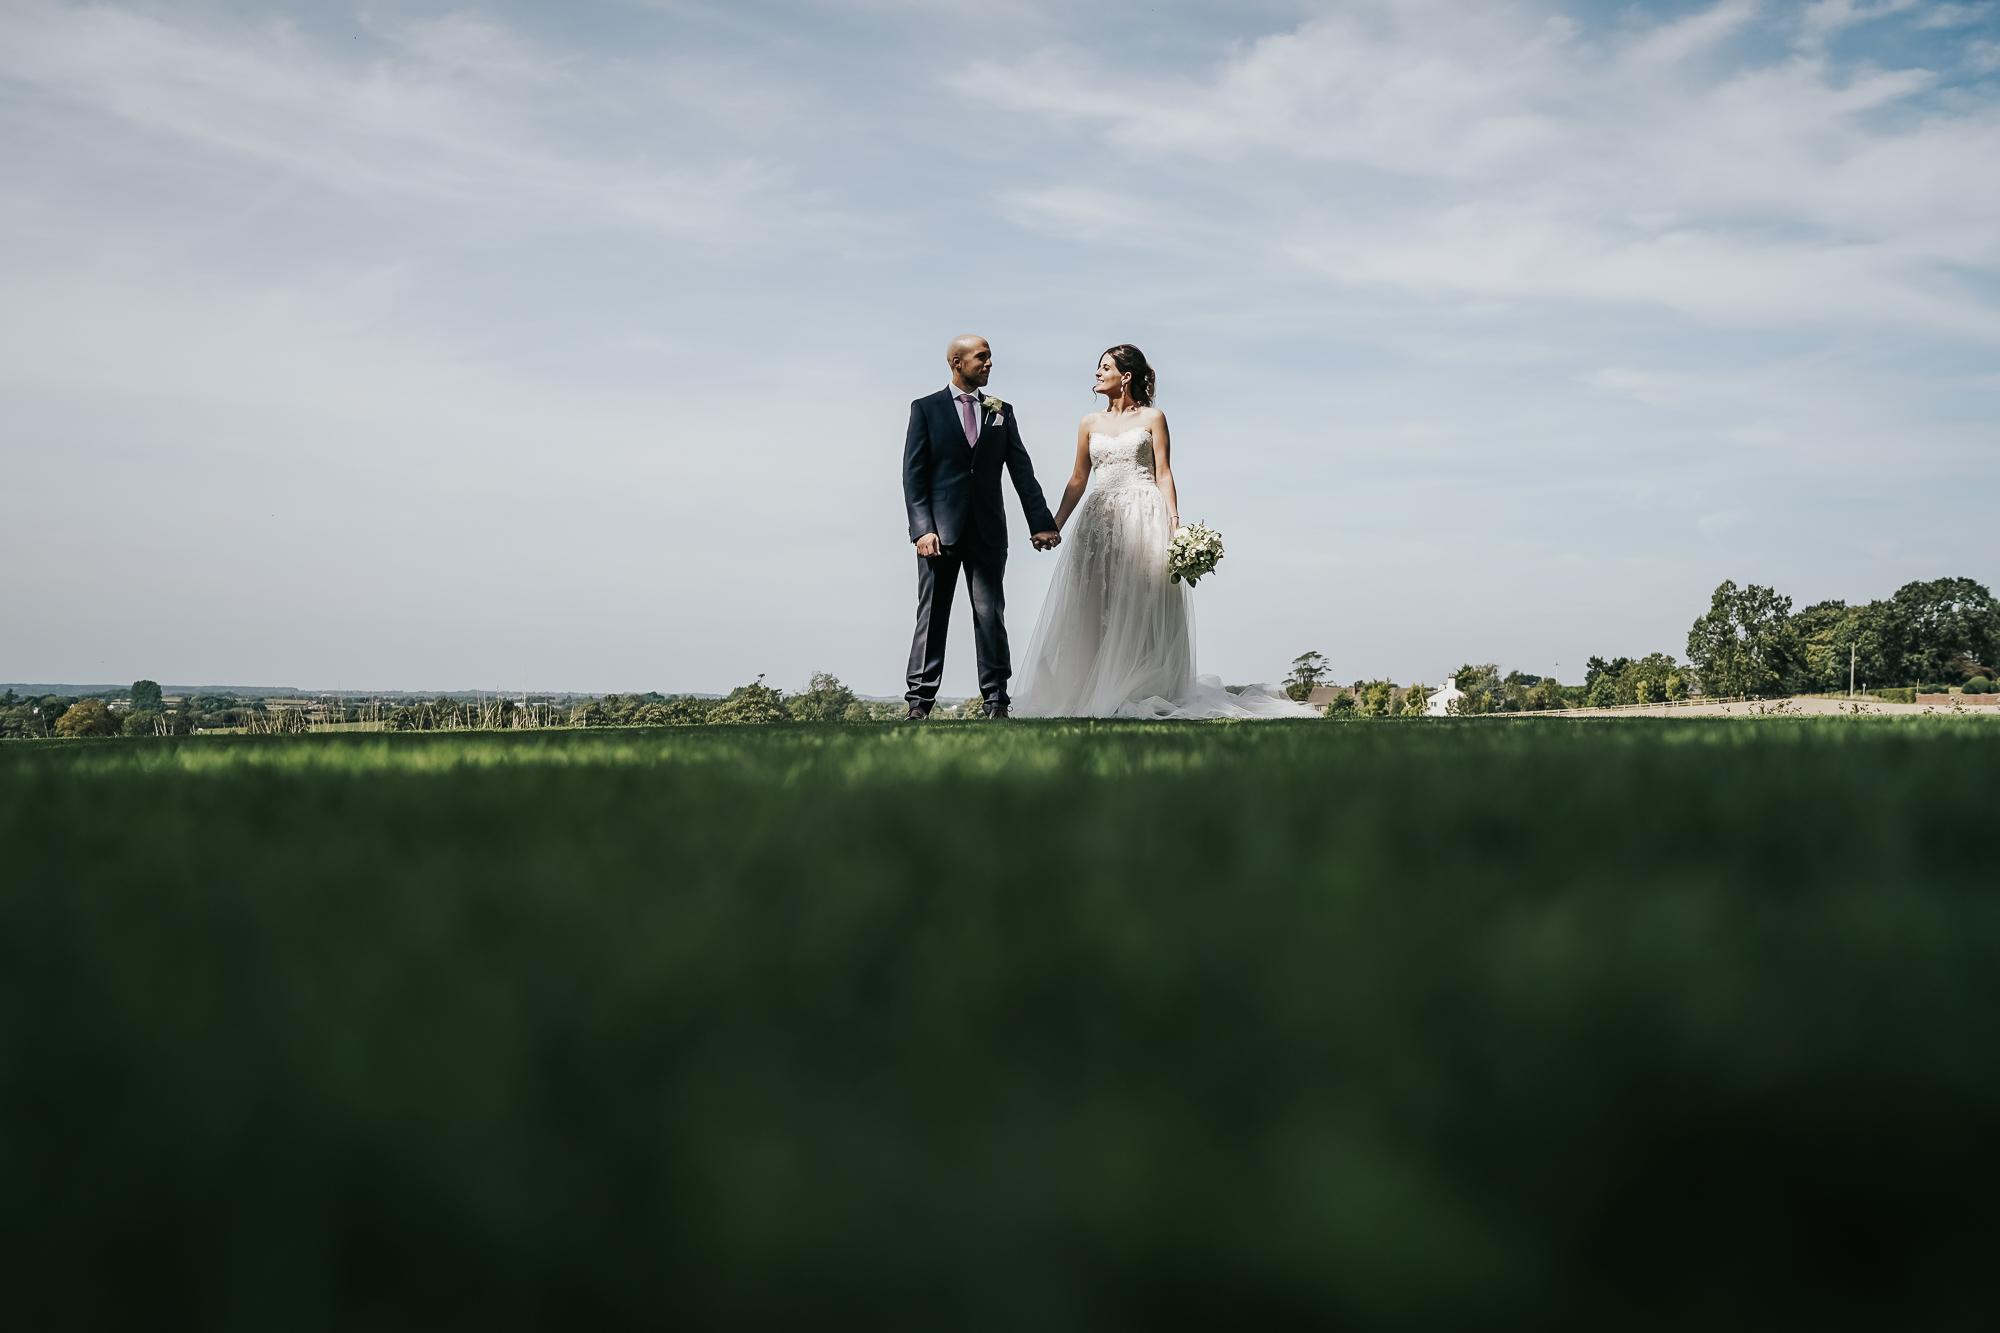 West Tower Wedding Venue Orkskirk Lancashire Wedding Photography cheshire wedding photographer (27 of 47).jpg